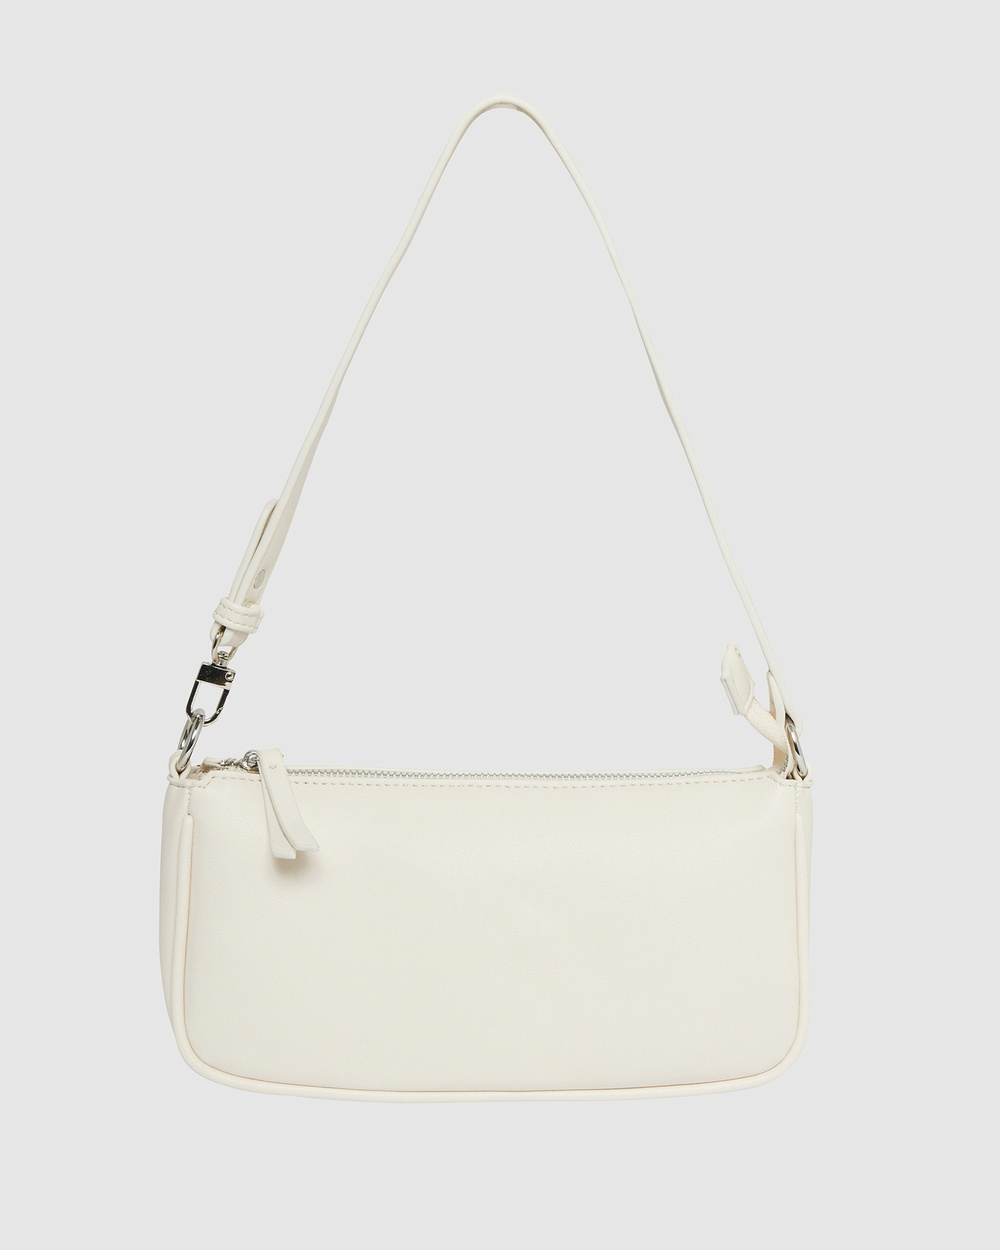 Sandler H Tang Handbags Ivory Pebble H-Tang